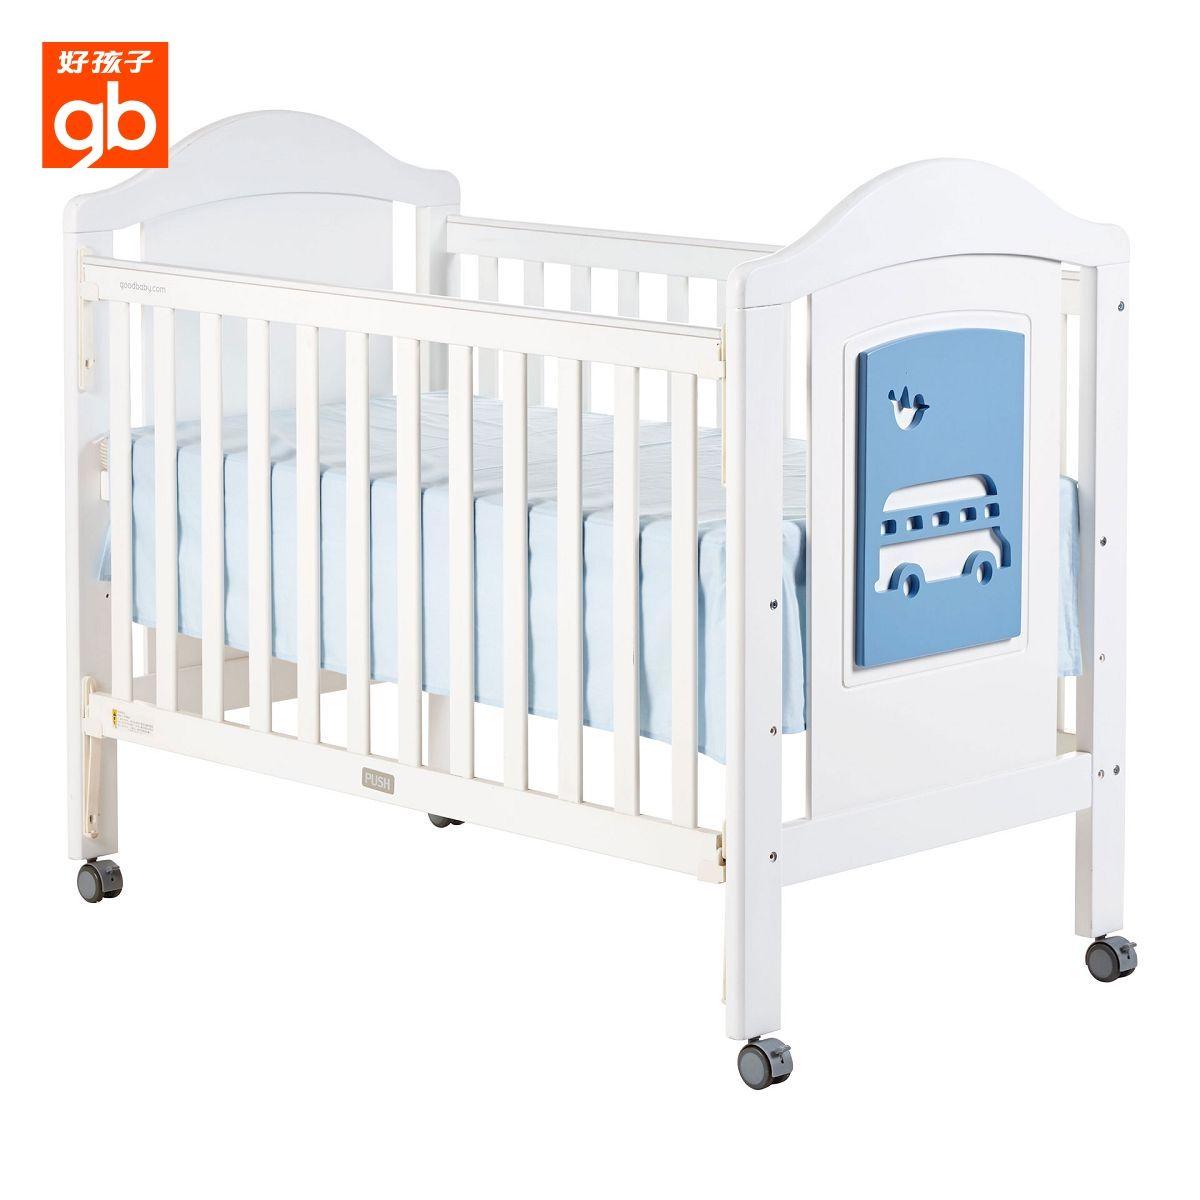 gb良い子ベビーベッドgoodbaby児童木造床多機能ベッド赤ちゃんMC839ゲーム